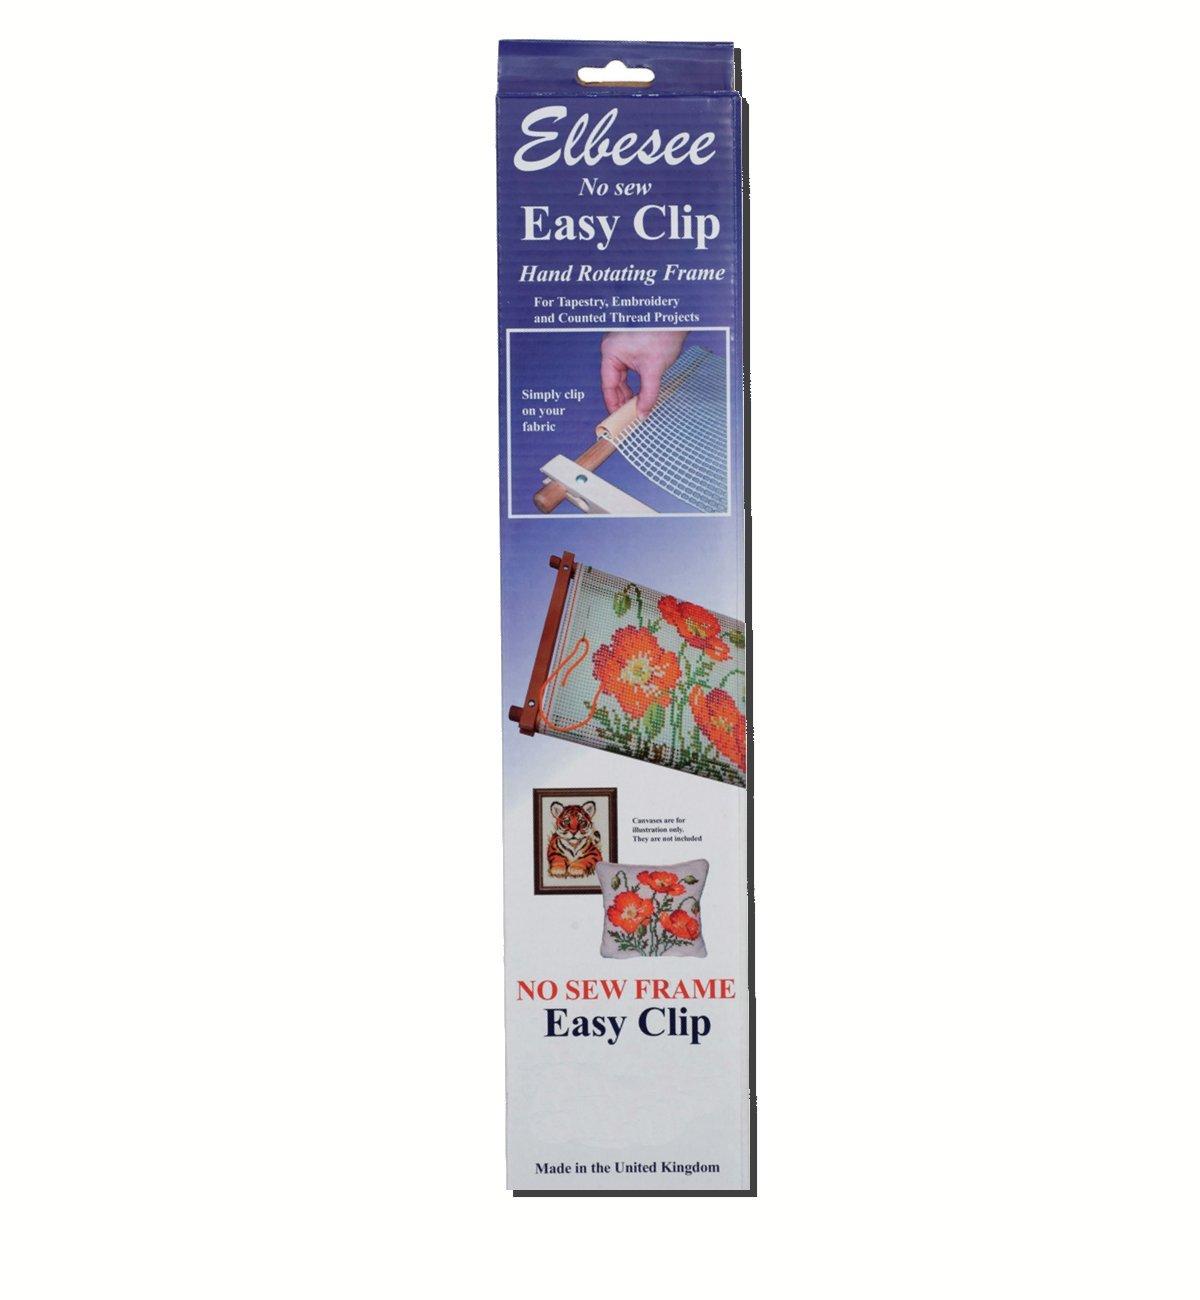 Elbesee Easy Clip Frames - Full Range Available! (24 x 12)